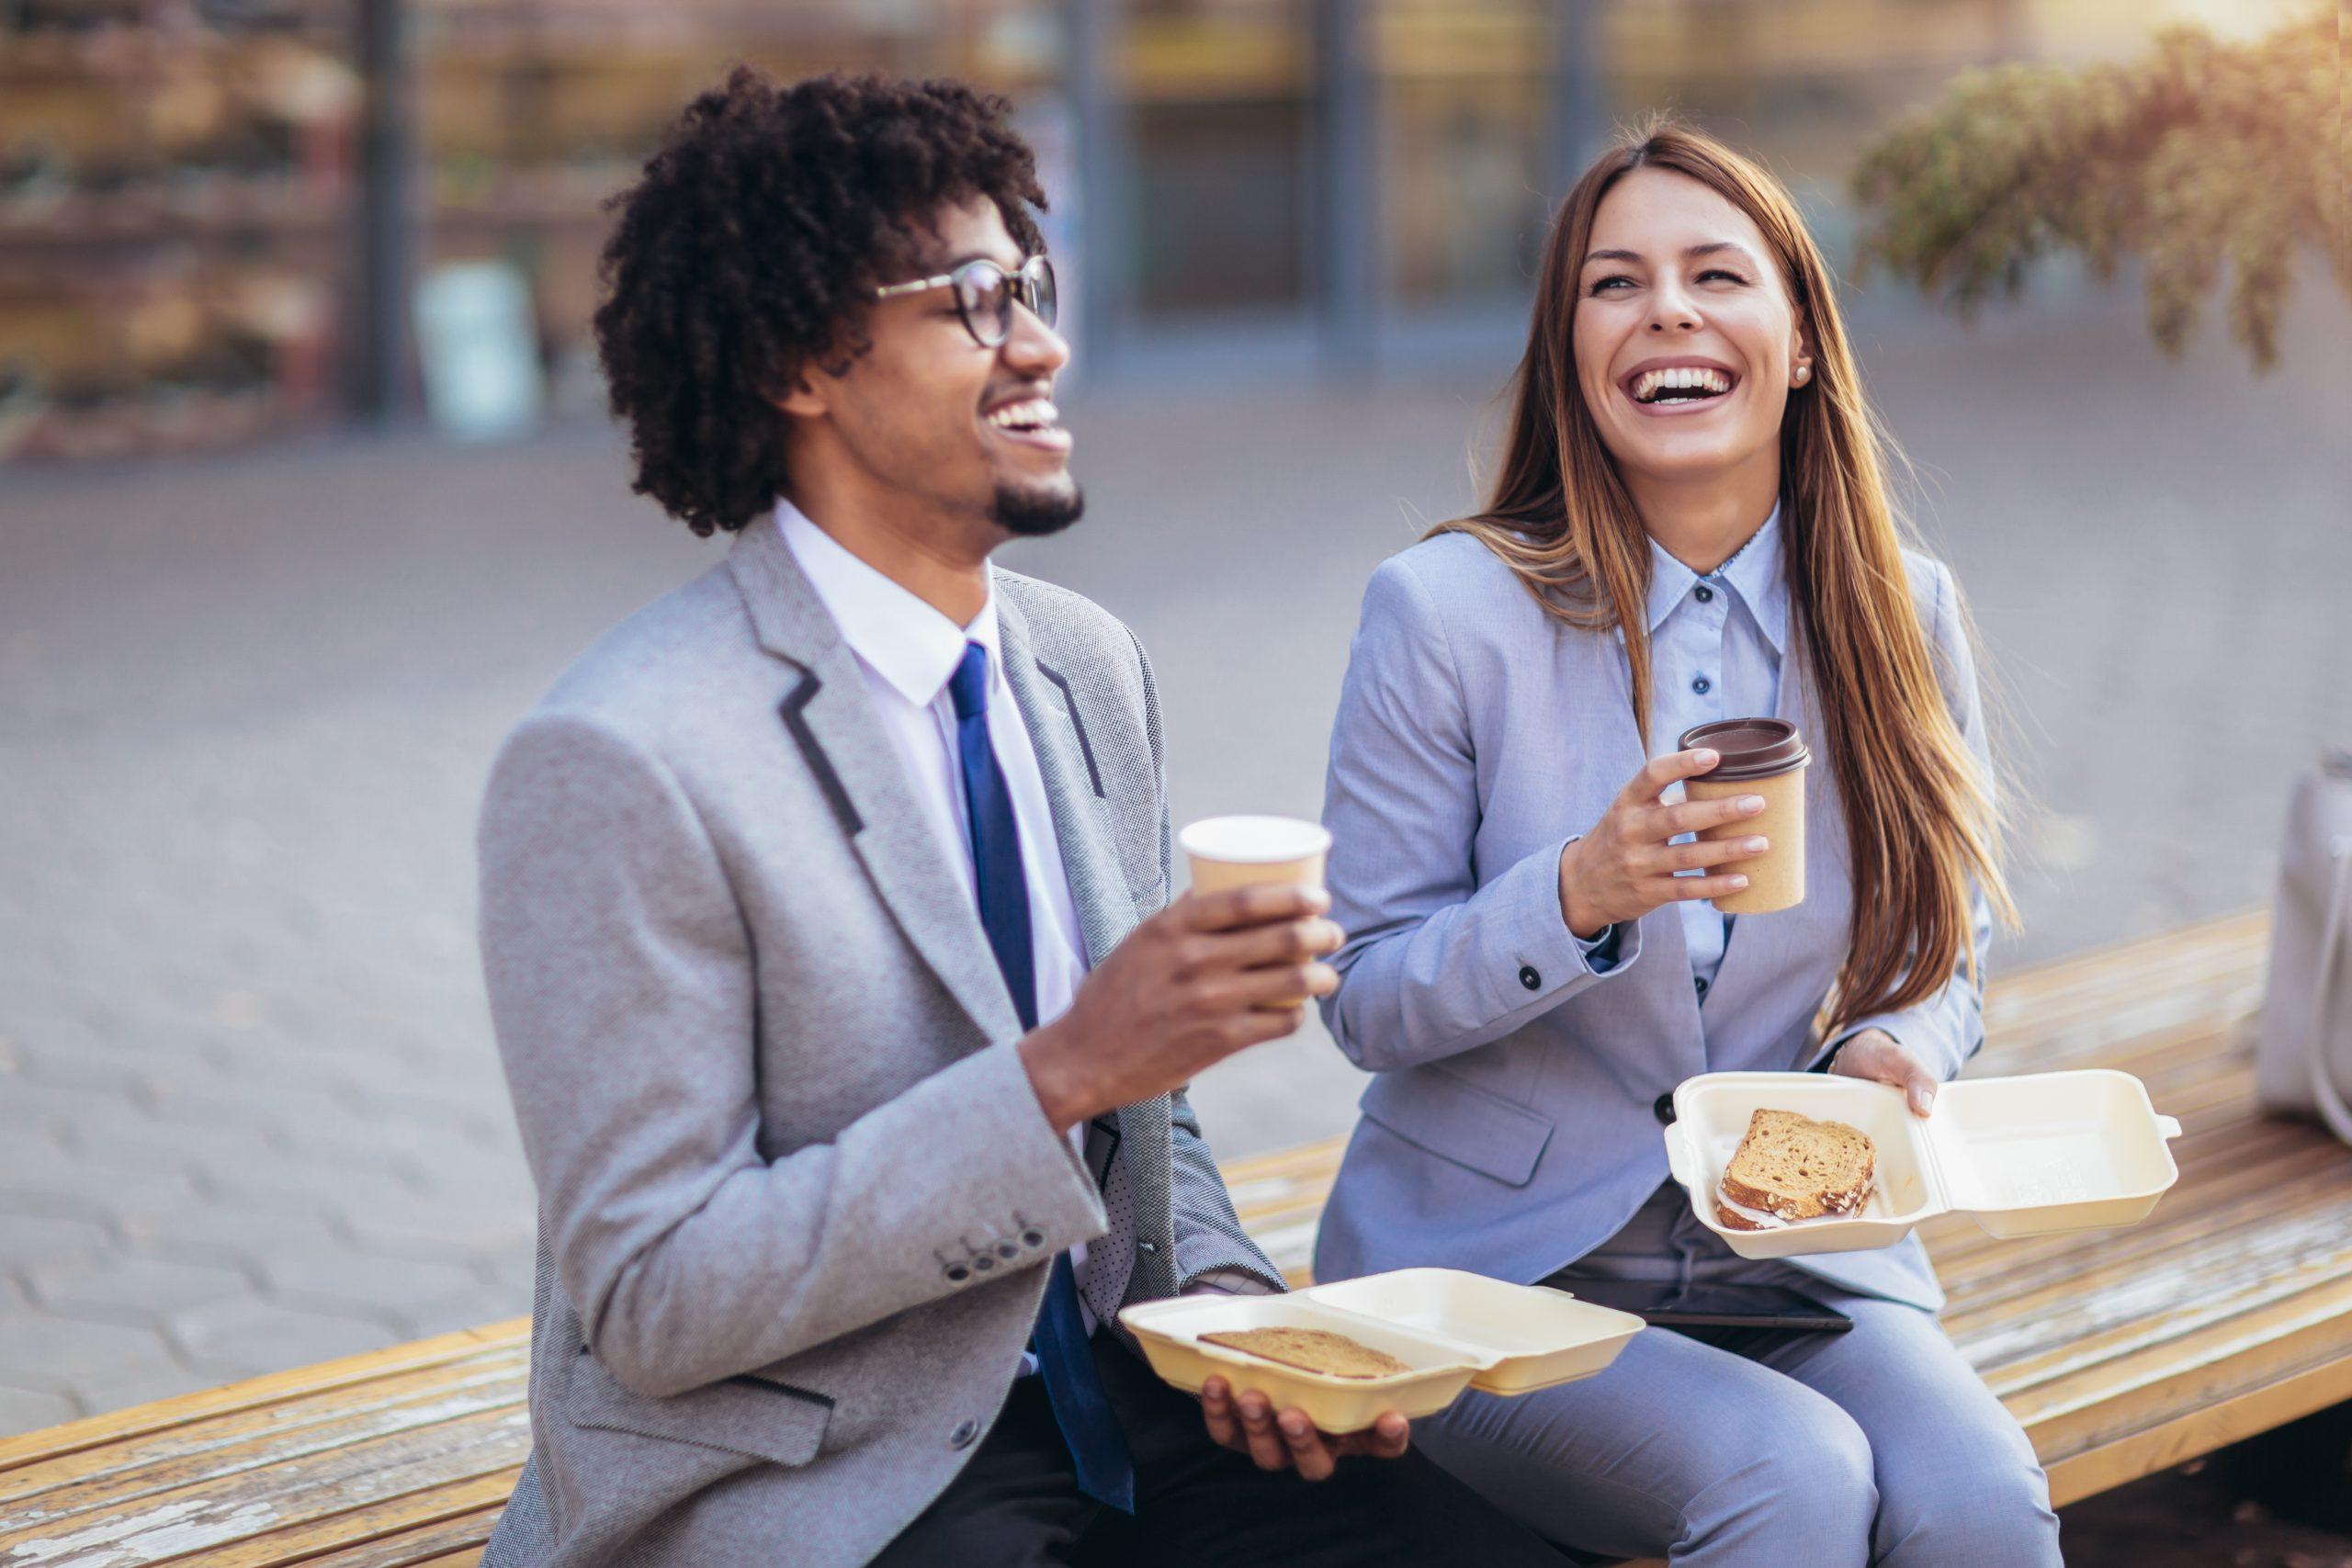 San Francisco Bay Area Break Room Solutions | Refreshment Services | Coffee and Tea | Modern Vending Machine